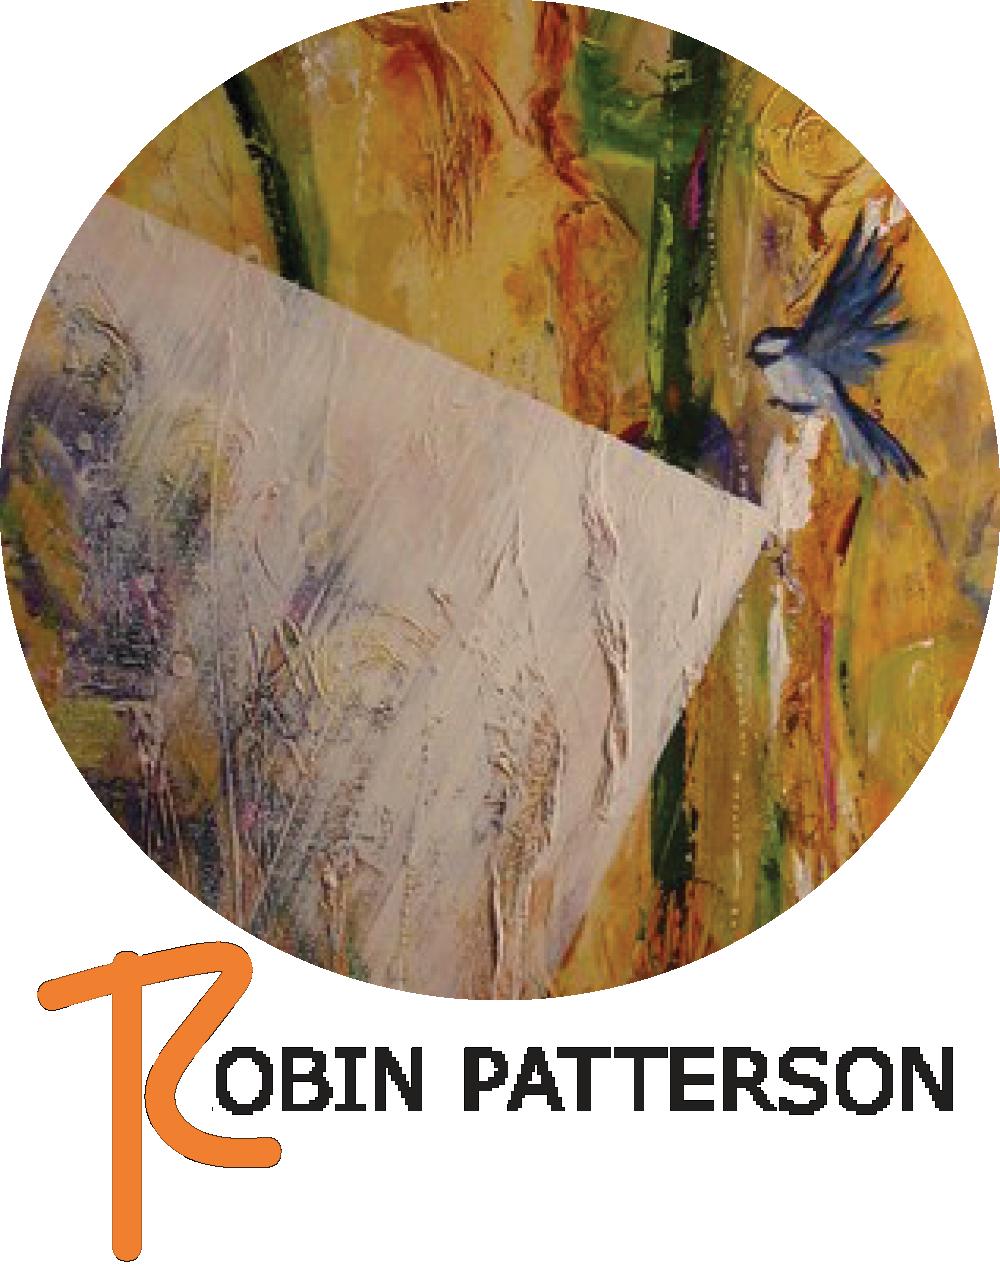 Robin Patterson